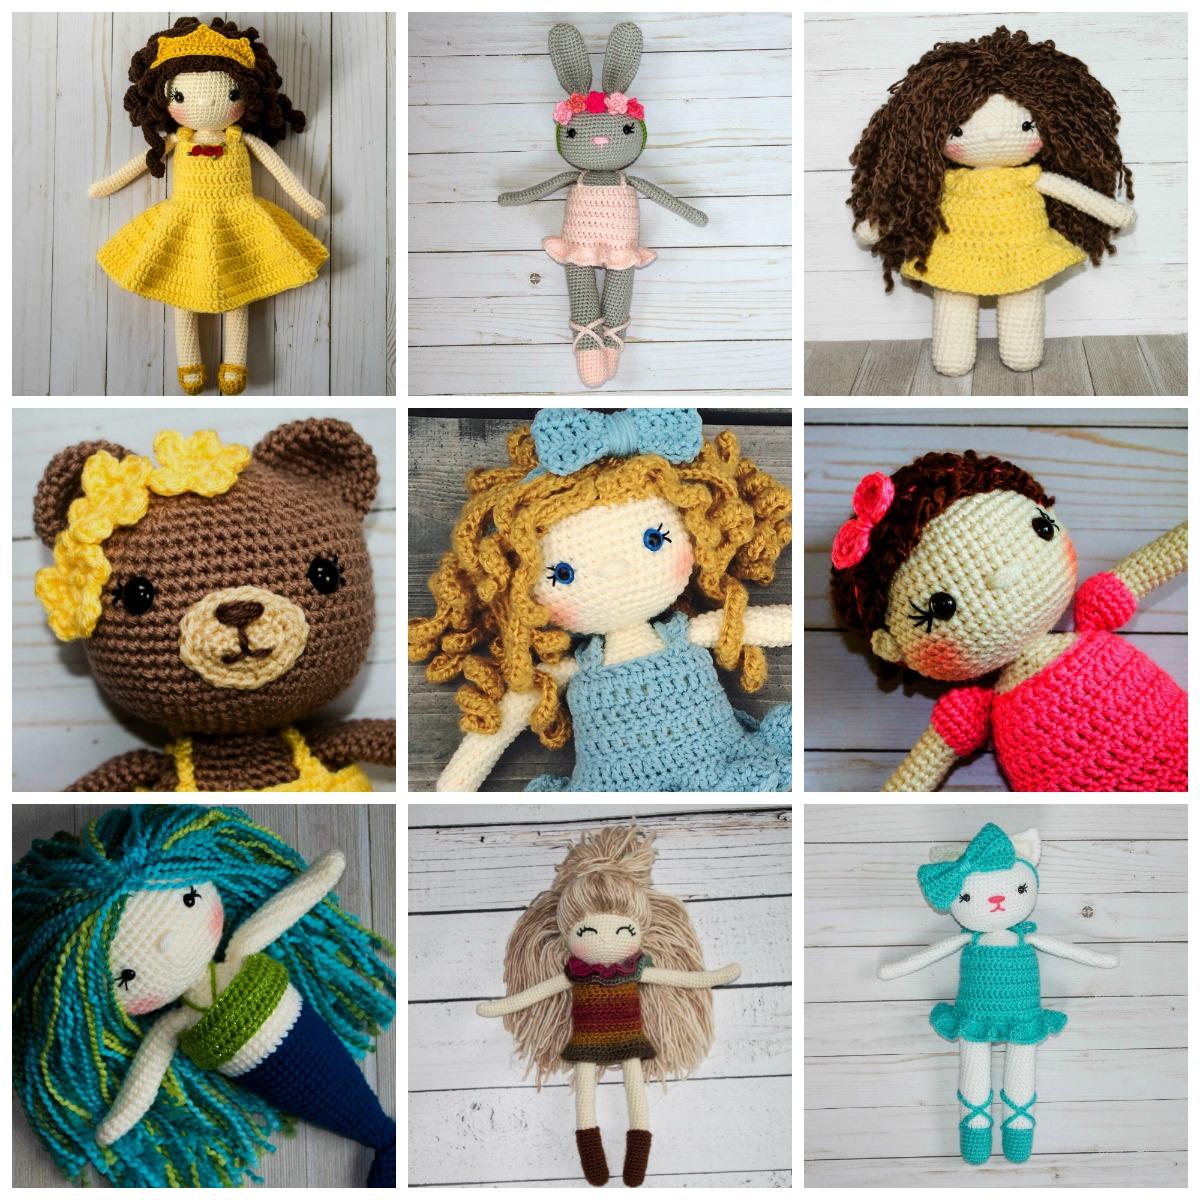 Molly Crocheted Amigurumi Doll [FREE Crochet Pattern] | 1200x1200